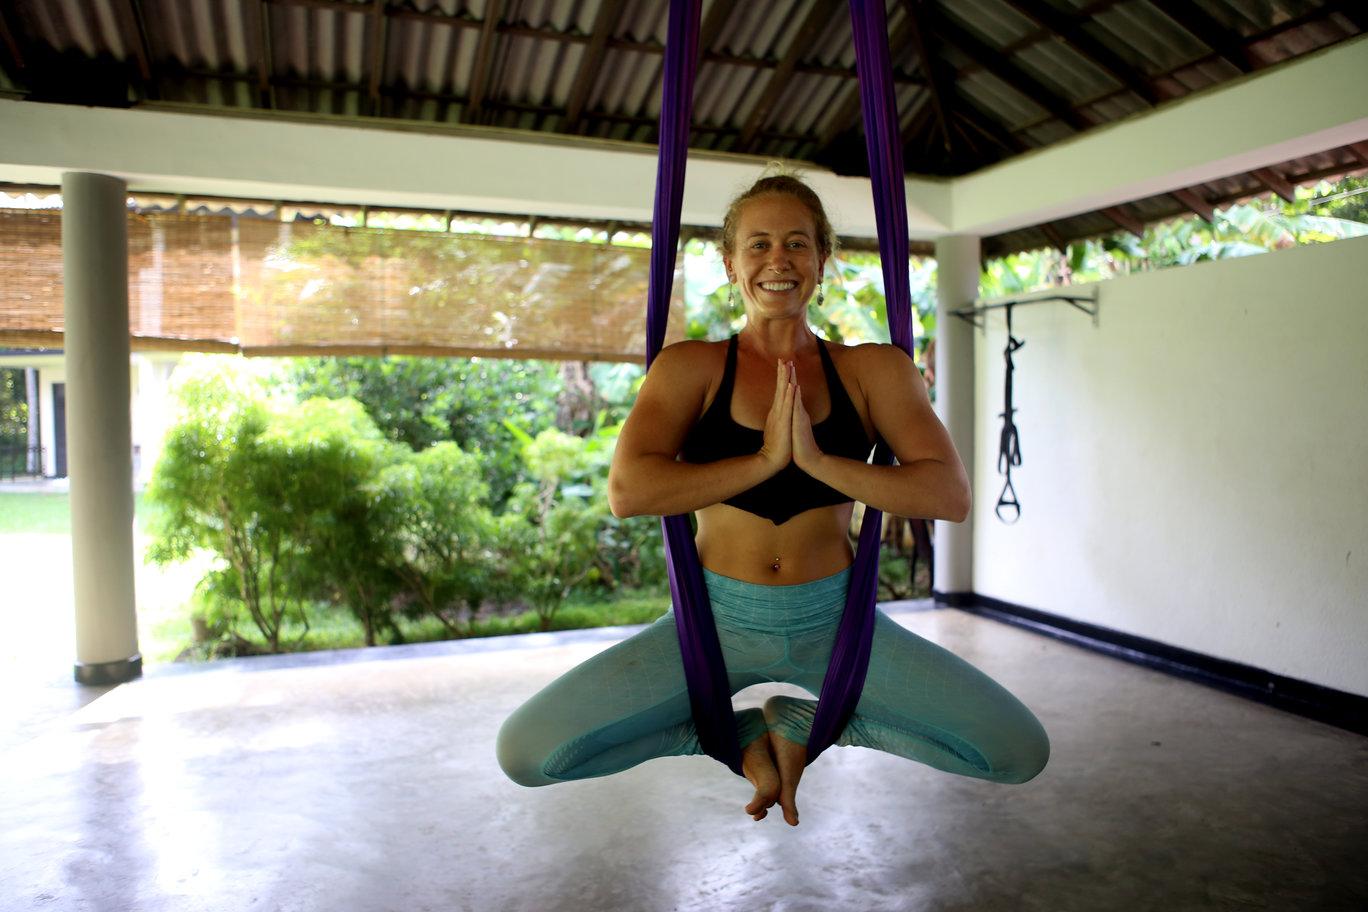 aerial yoga teacher training koh phangan thailand 2018 september